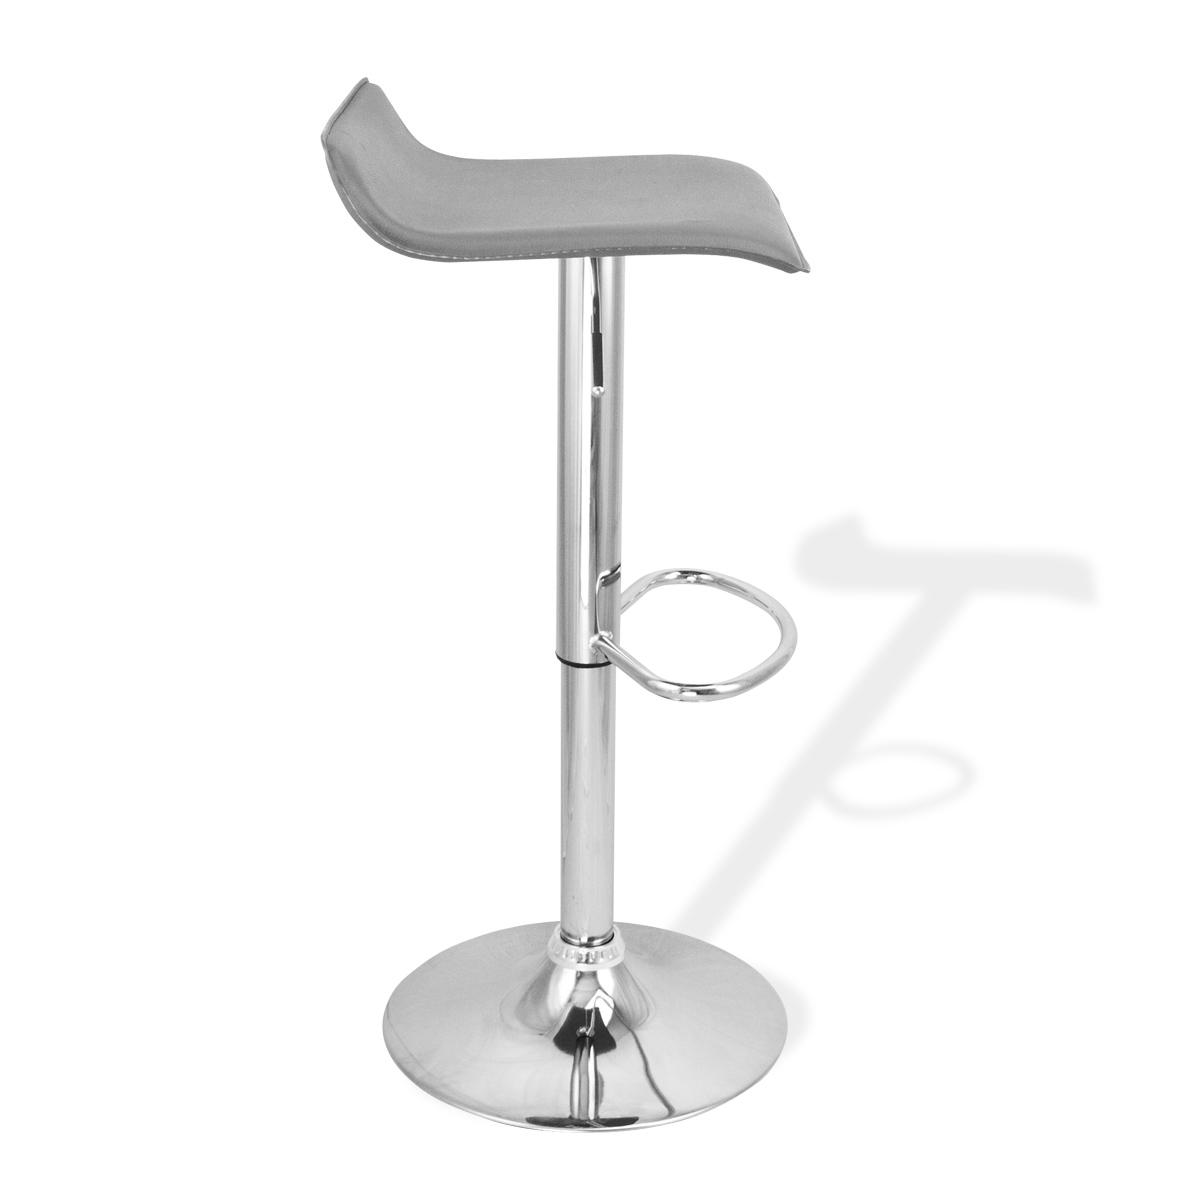 bar stool chair grey milo baughman chairs 4 new modern swivel bombo pub